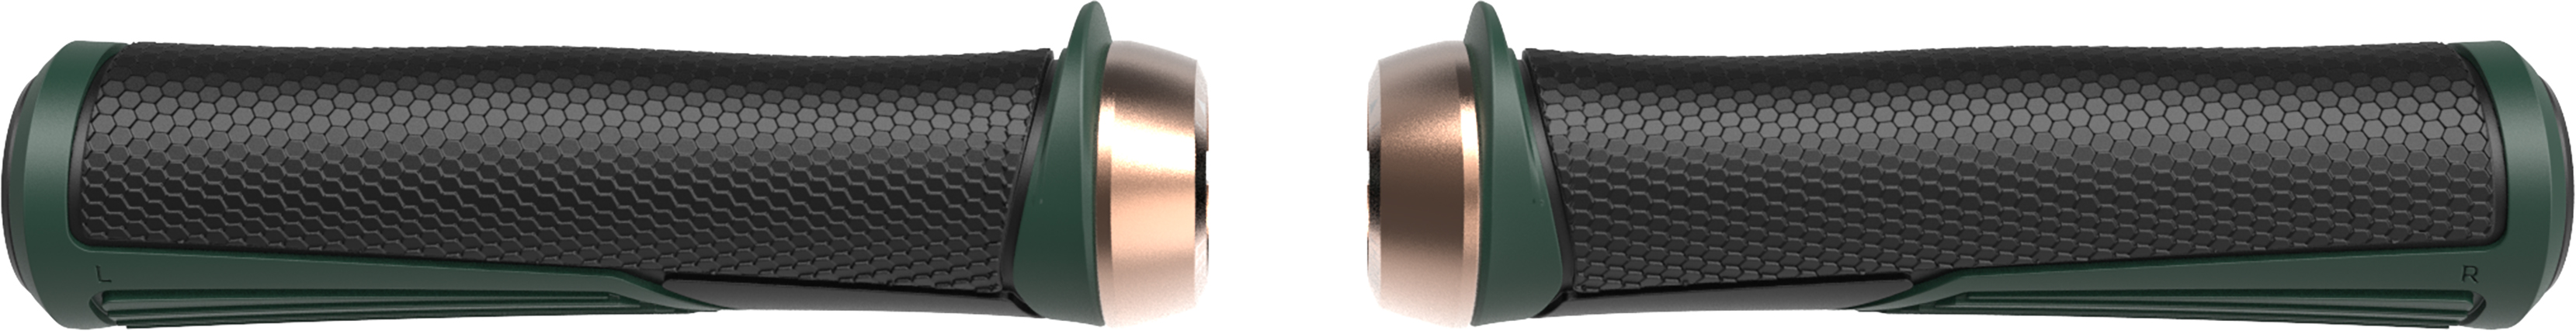 Грипсы BBB Cobra 142mm / moss green / lockring copper зелёный, Рулевая группа - арт. 1022260362